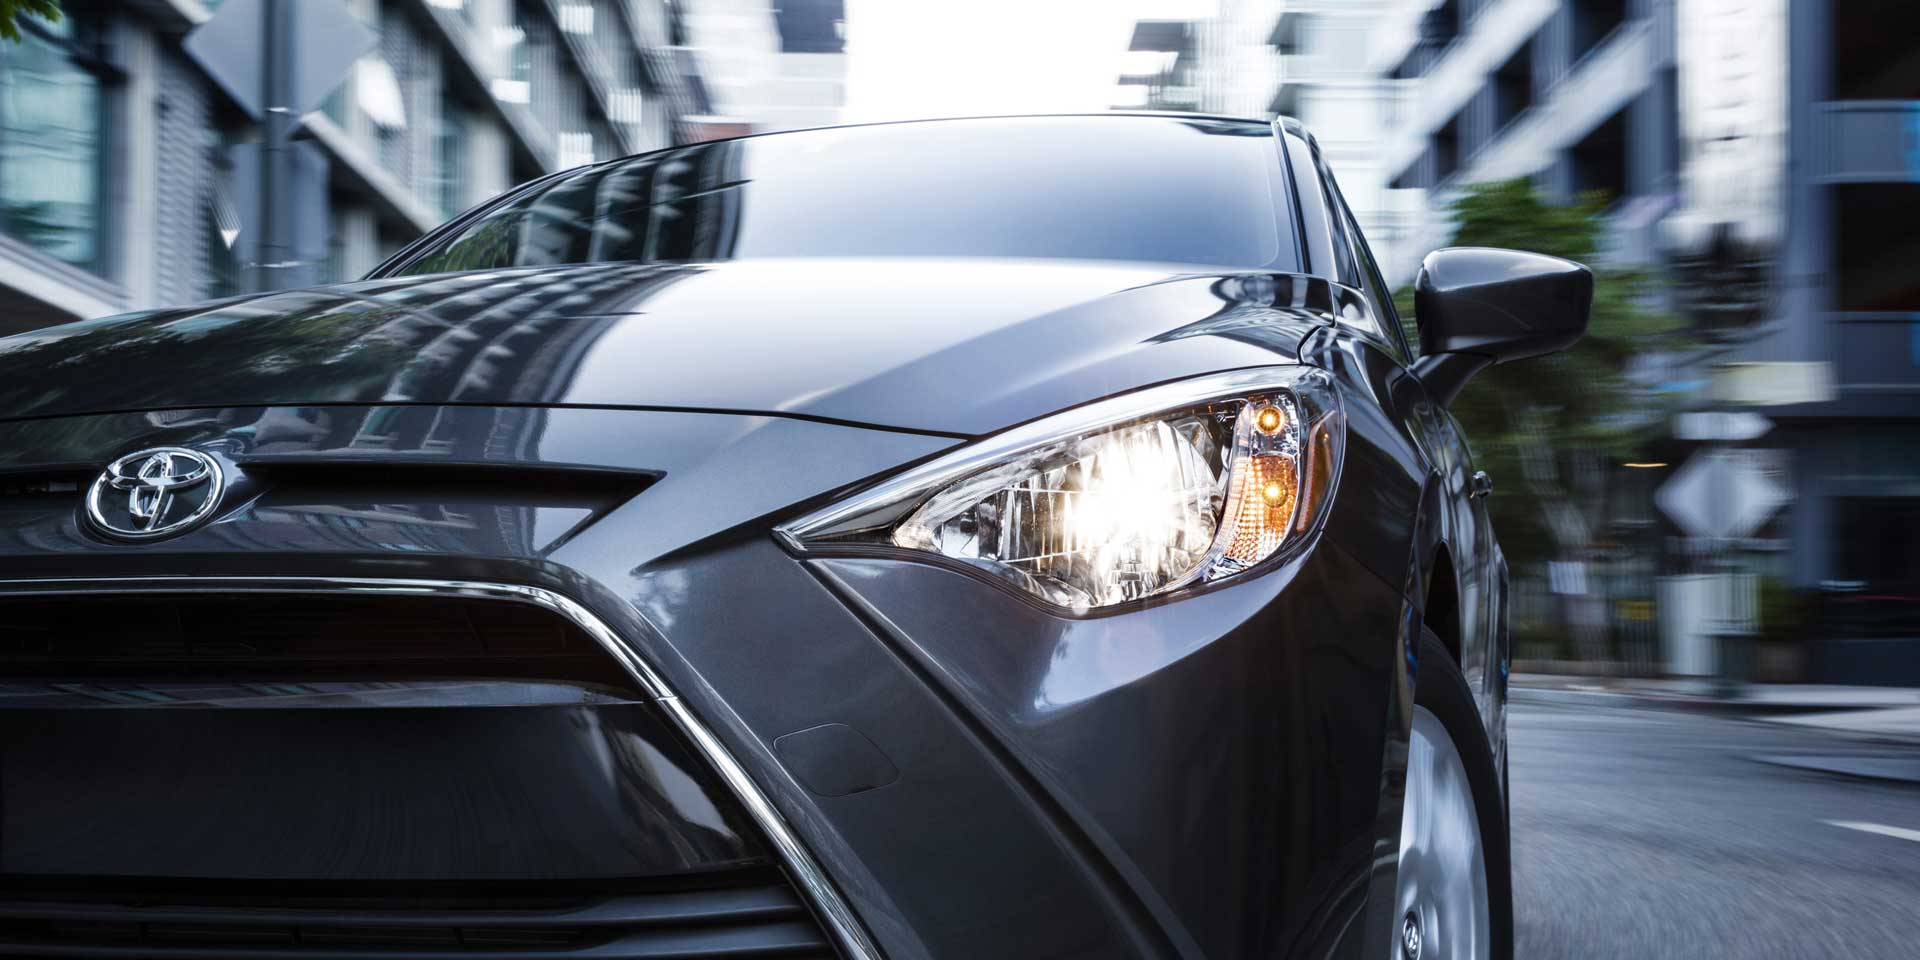 toyota yaris ia trd 2017 vehicles on display chicago